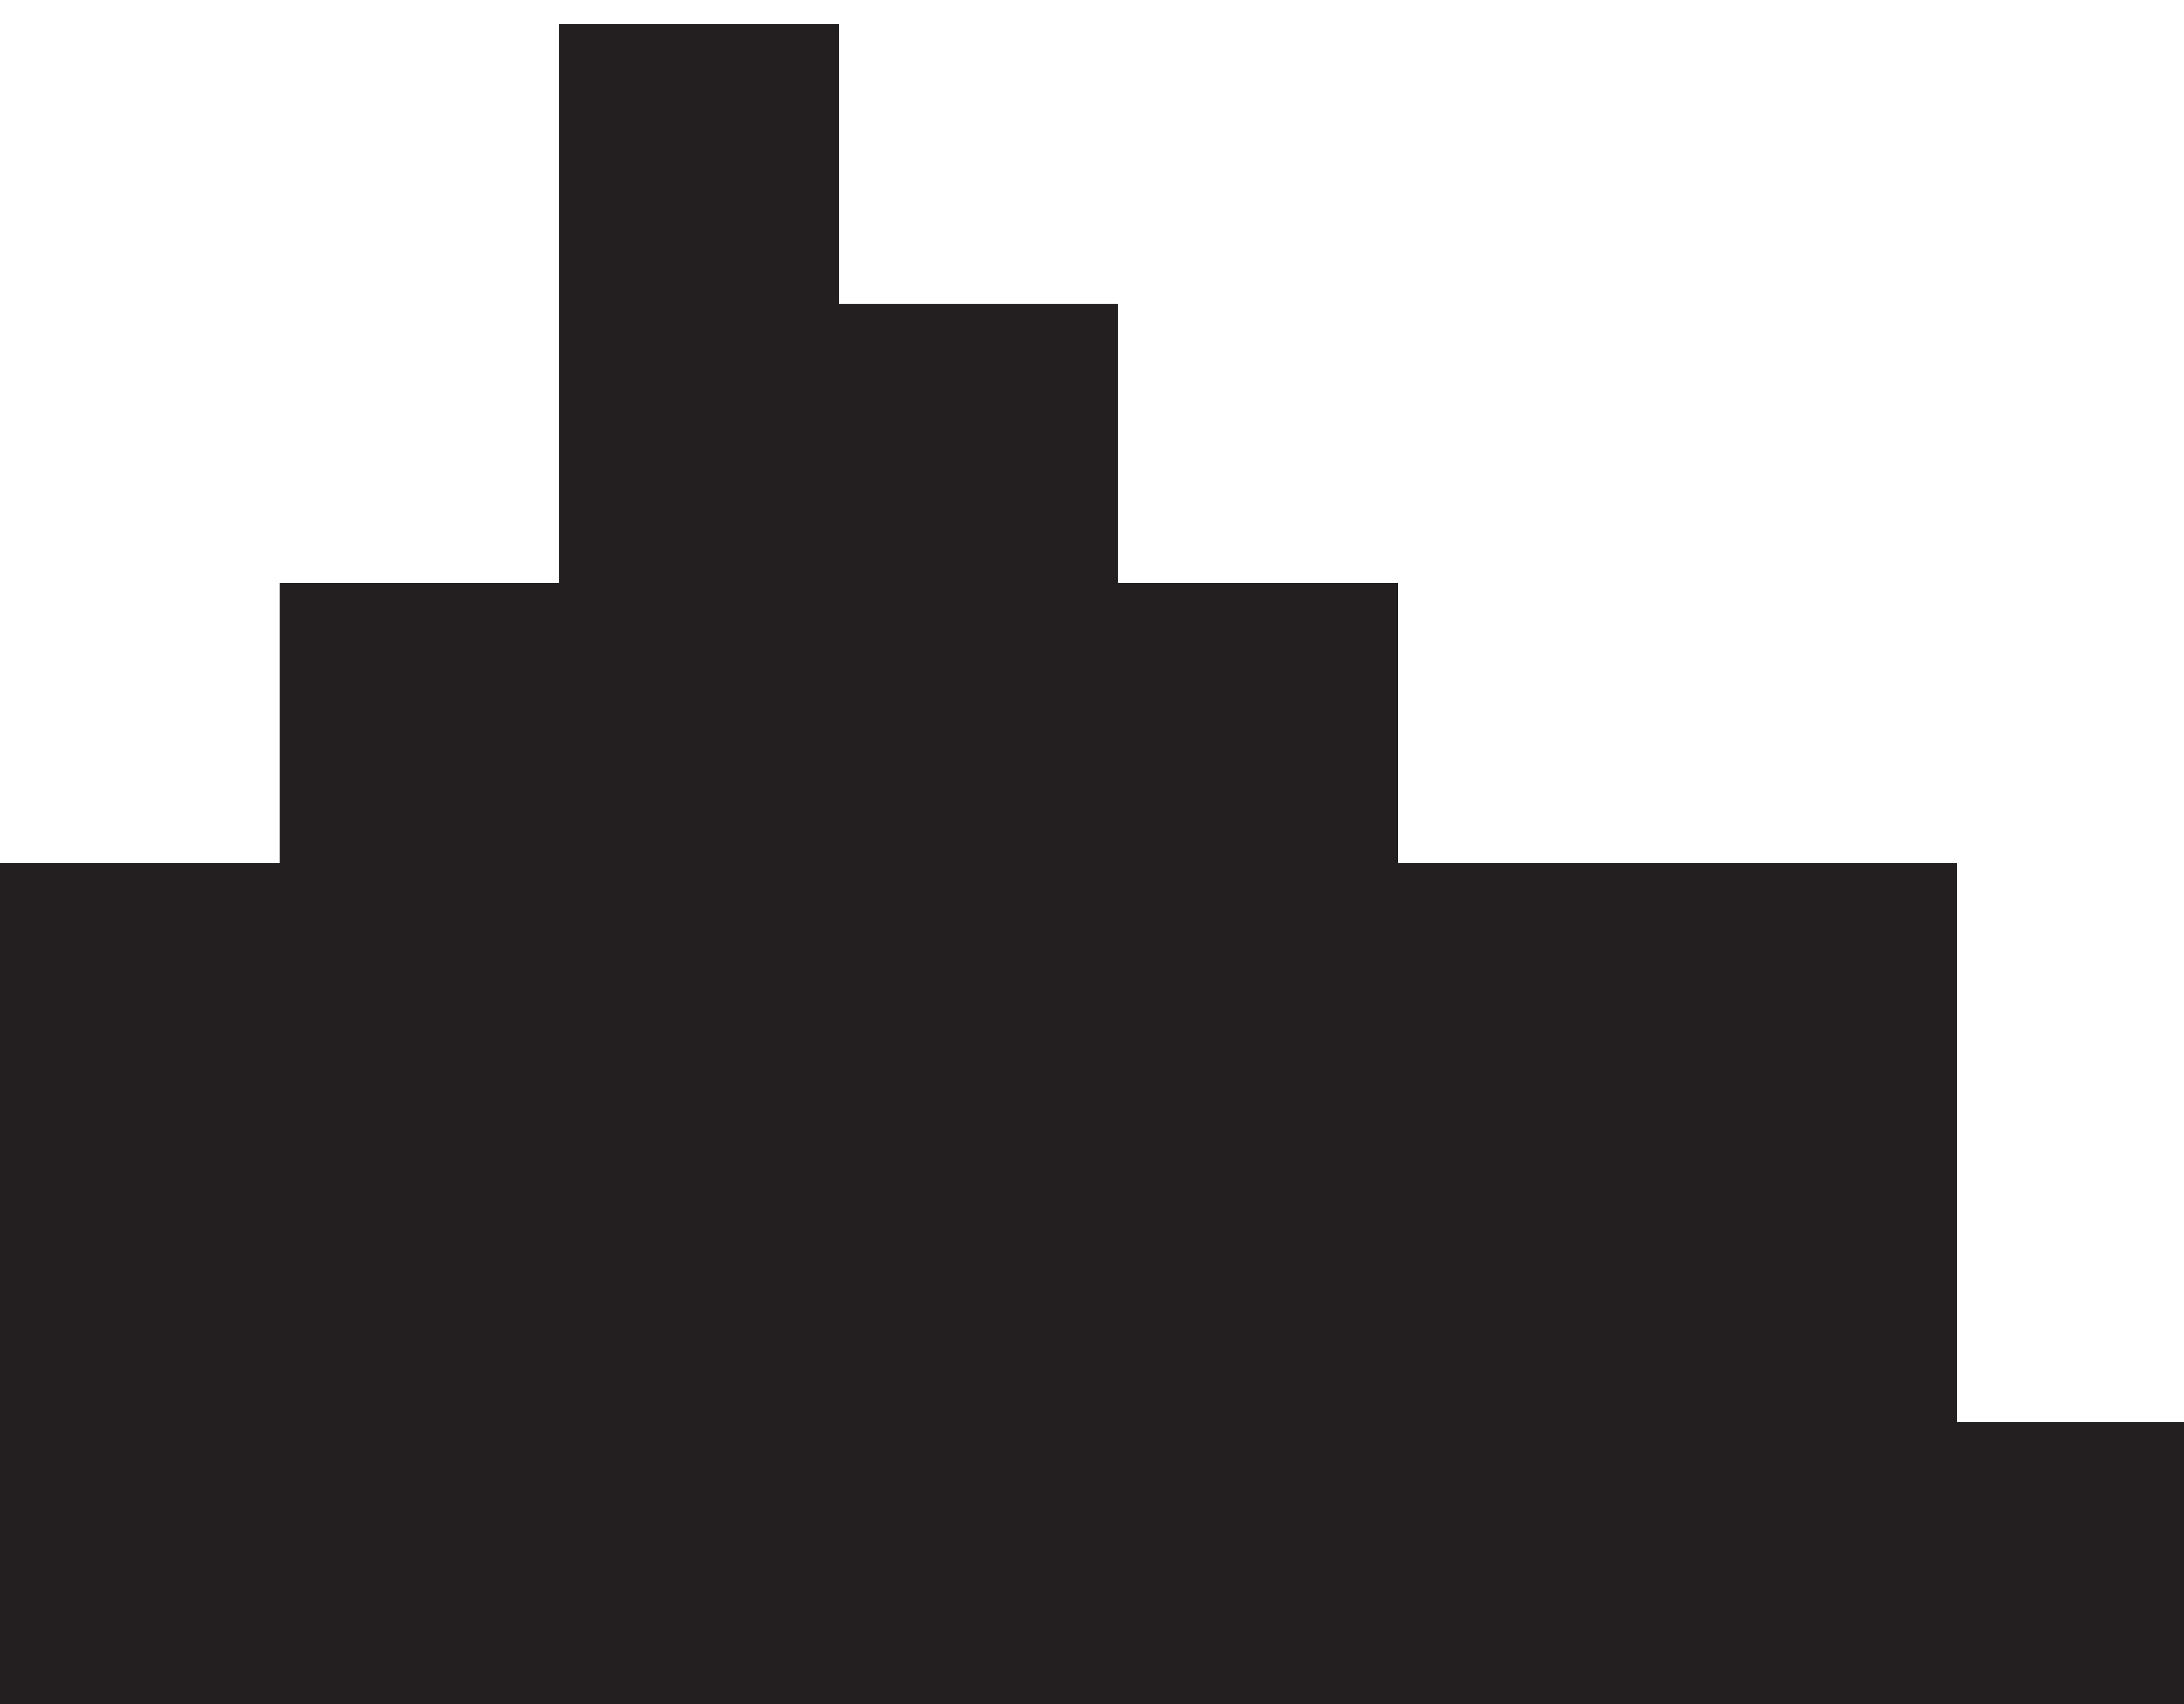 8000x6241 Castle Silhouette Png Clip Artu200b Gallery Yopriceville